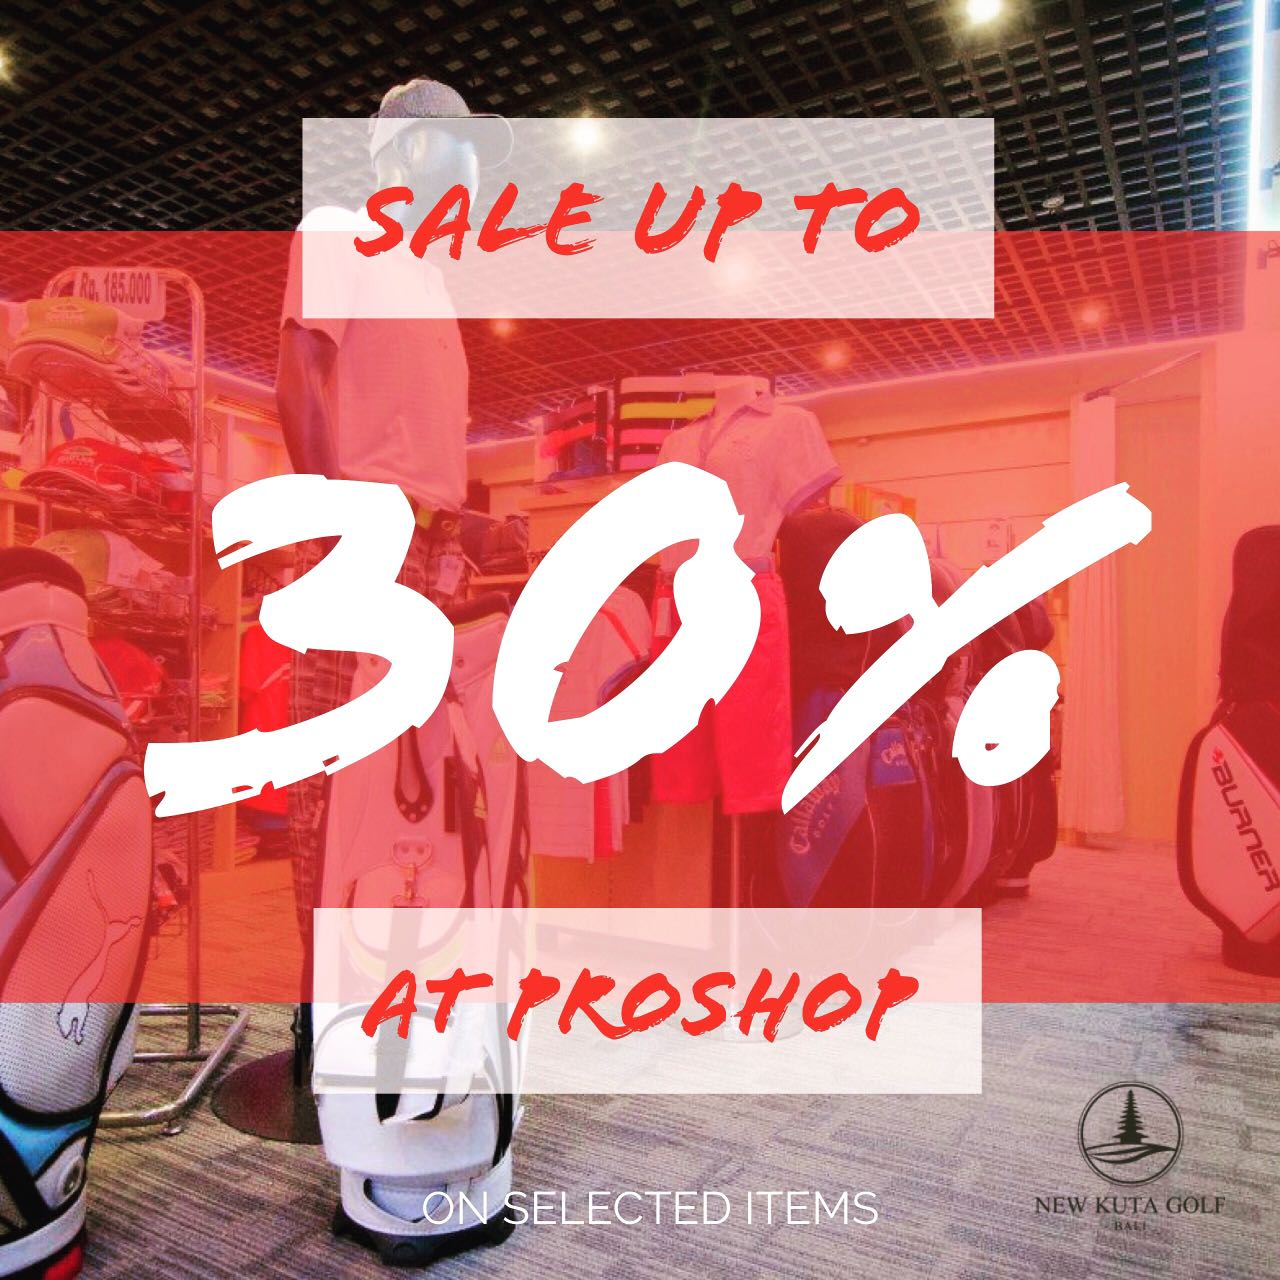 Proshop Discount